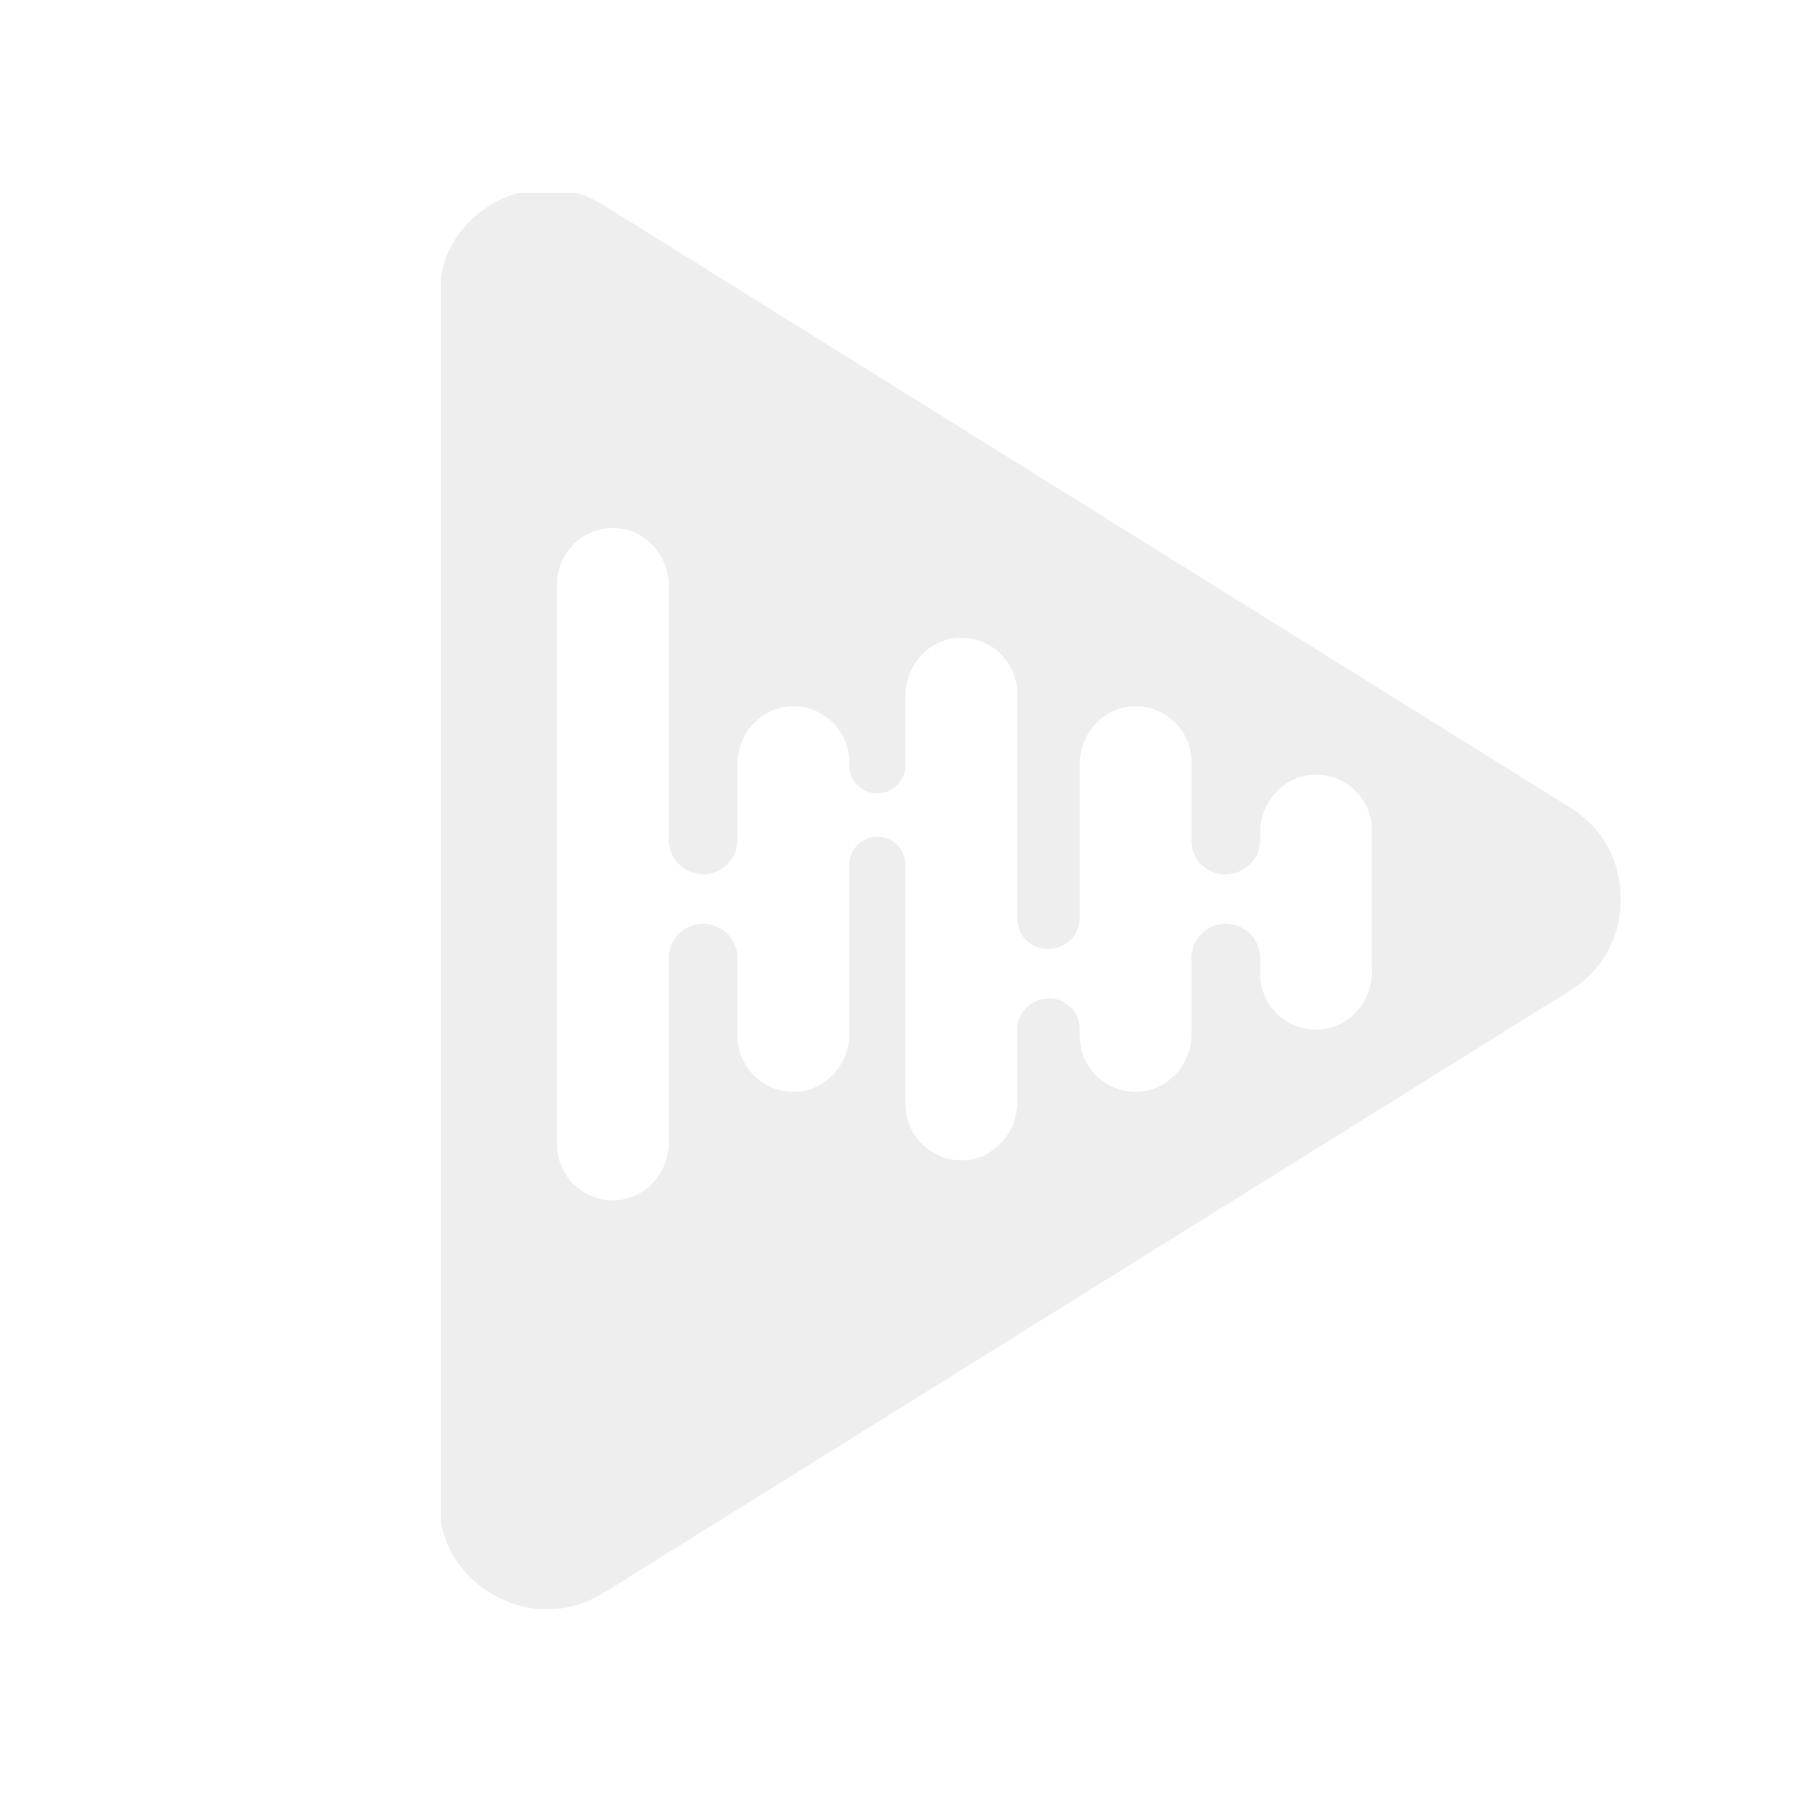 Speedsignal C-3474105